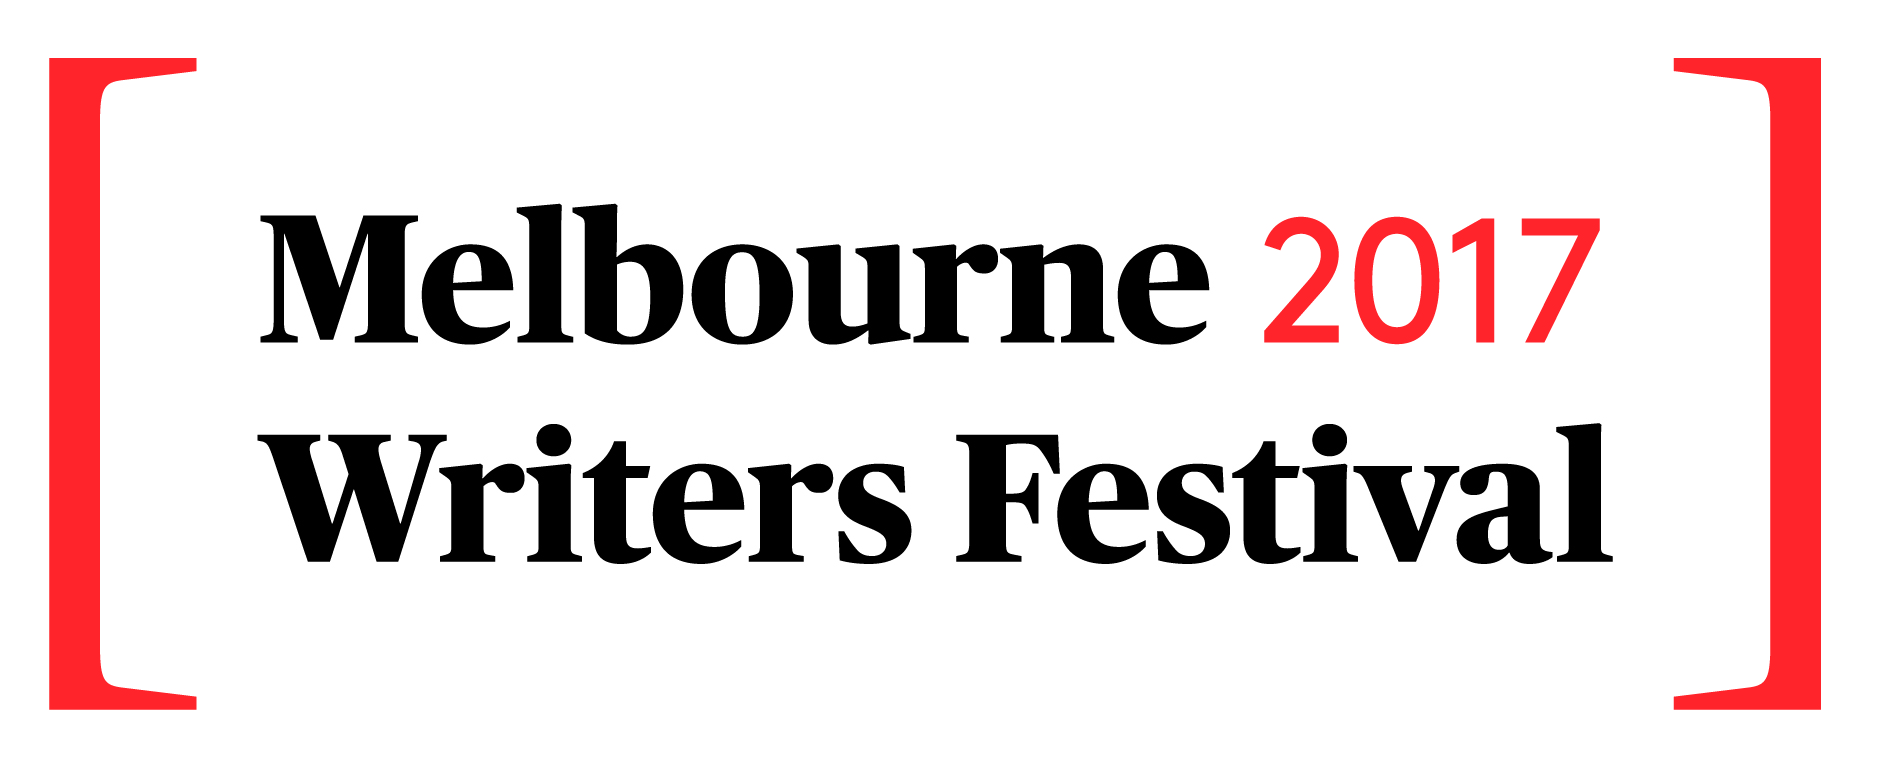 melbournewritersfestival2017cmyk.jpg